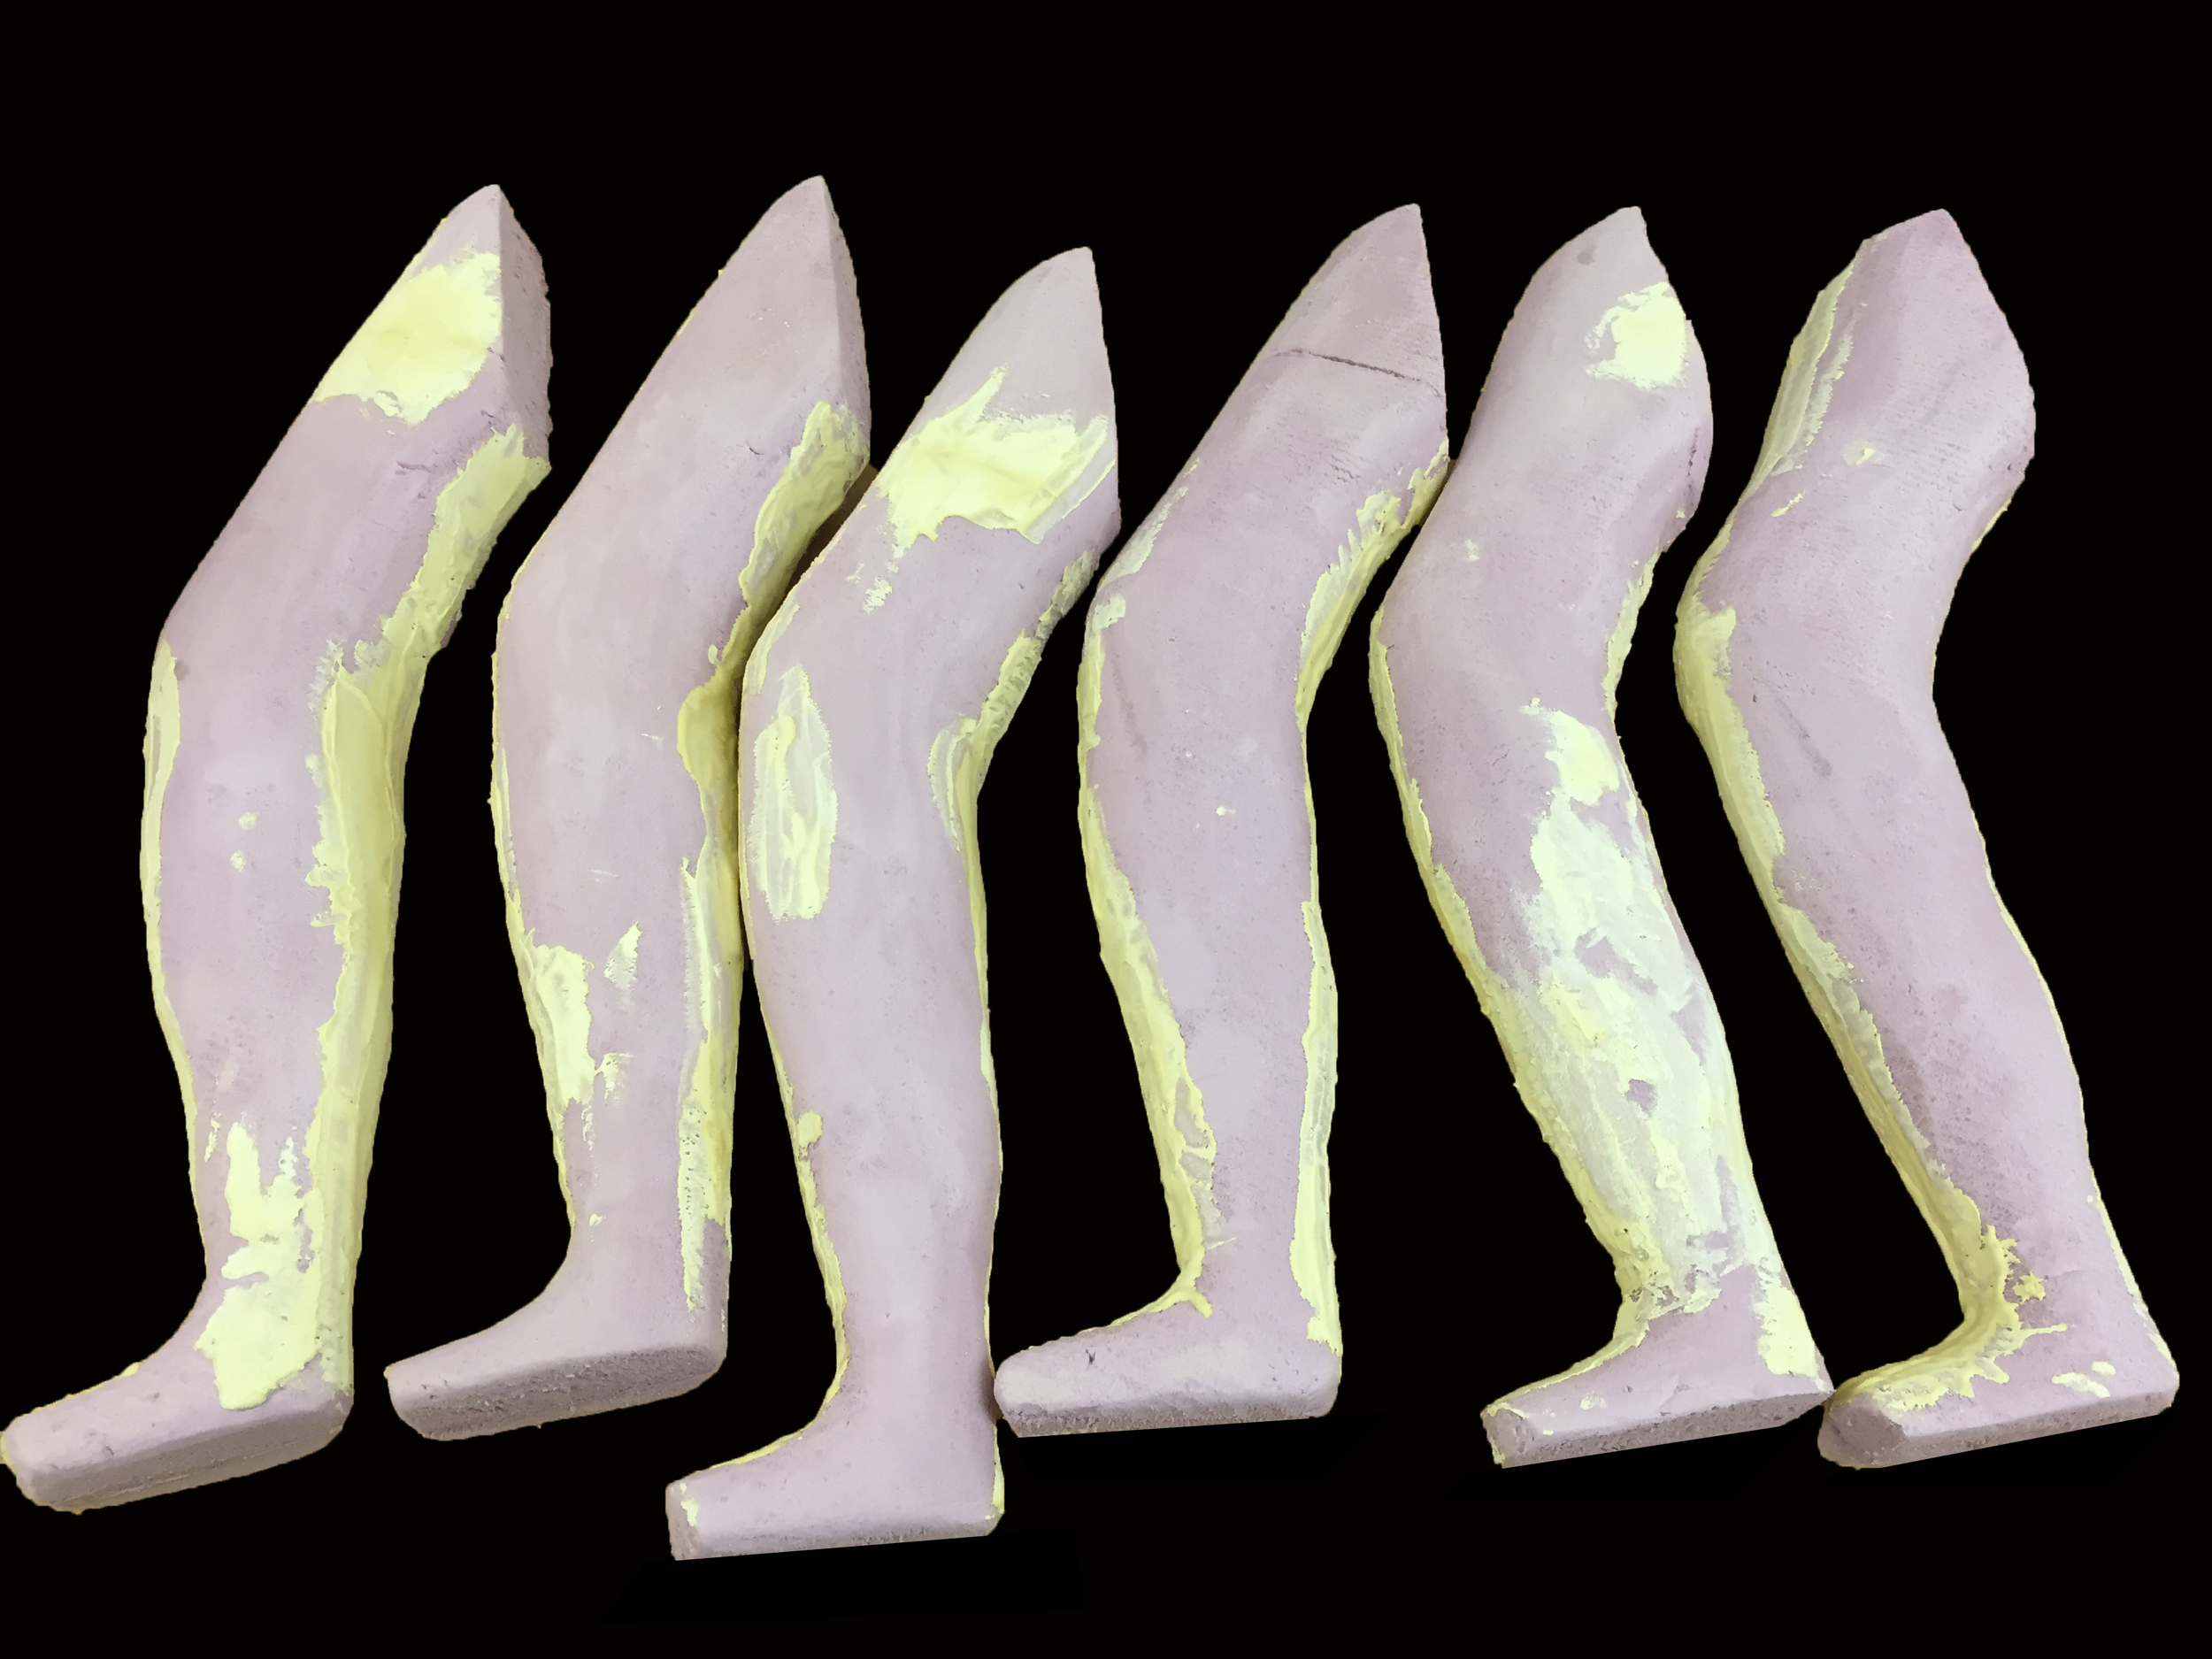 Legs assembled and glued